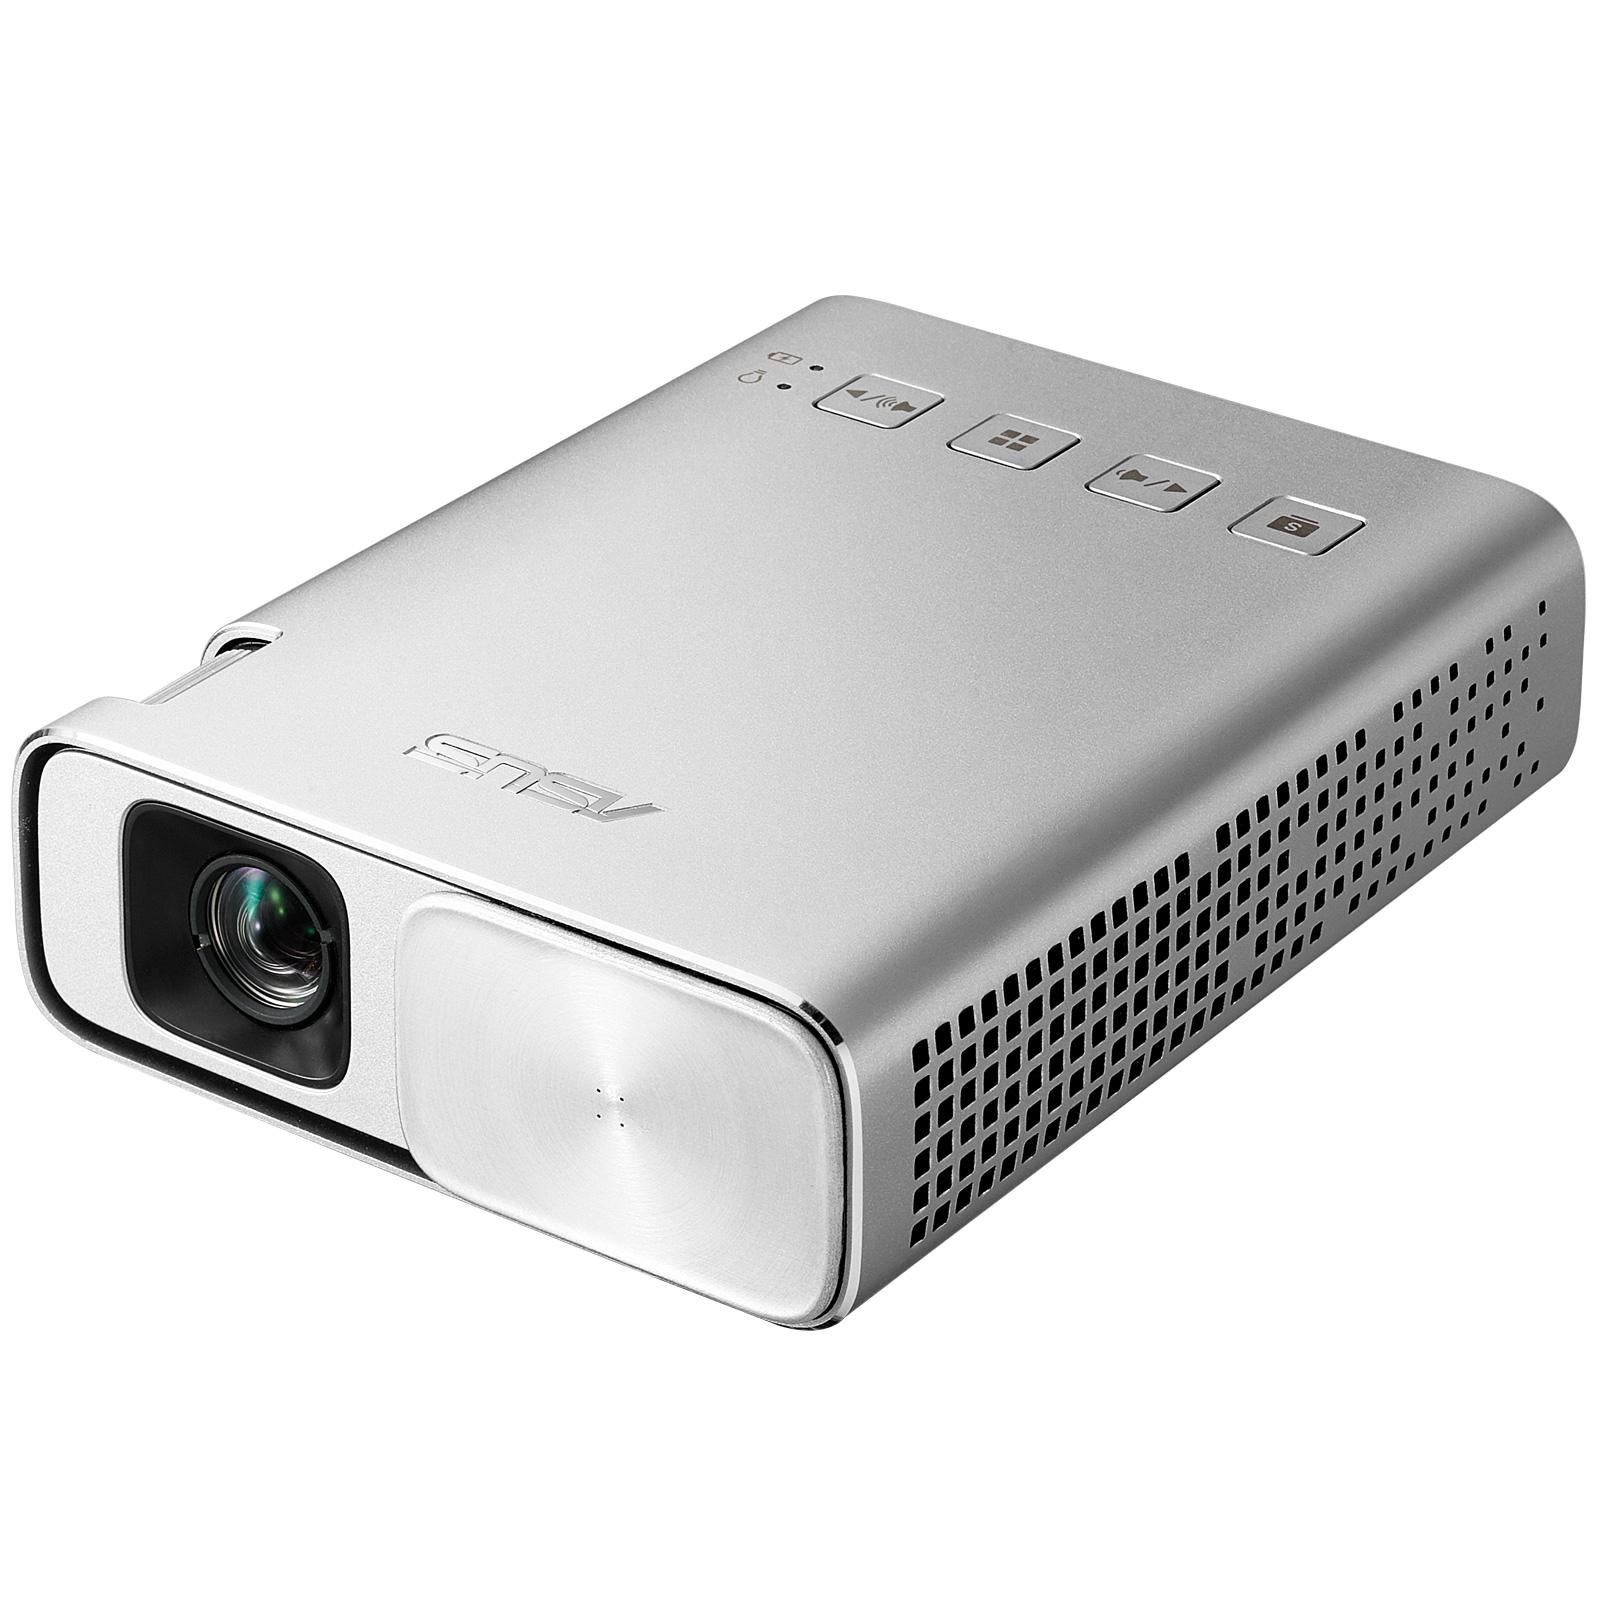 ASUS ZenBeam E1 Portable projector 150ANSI lumens DLP WVGA (854x480) Silver data projector